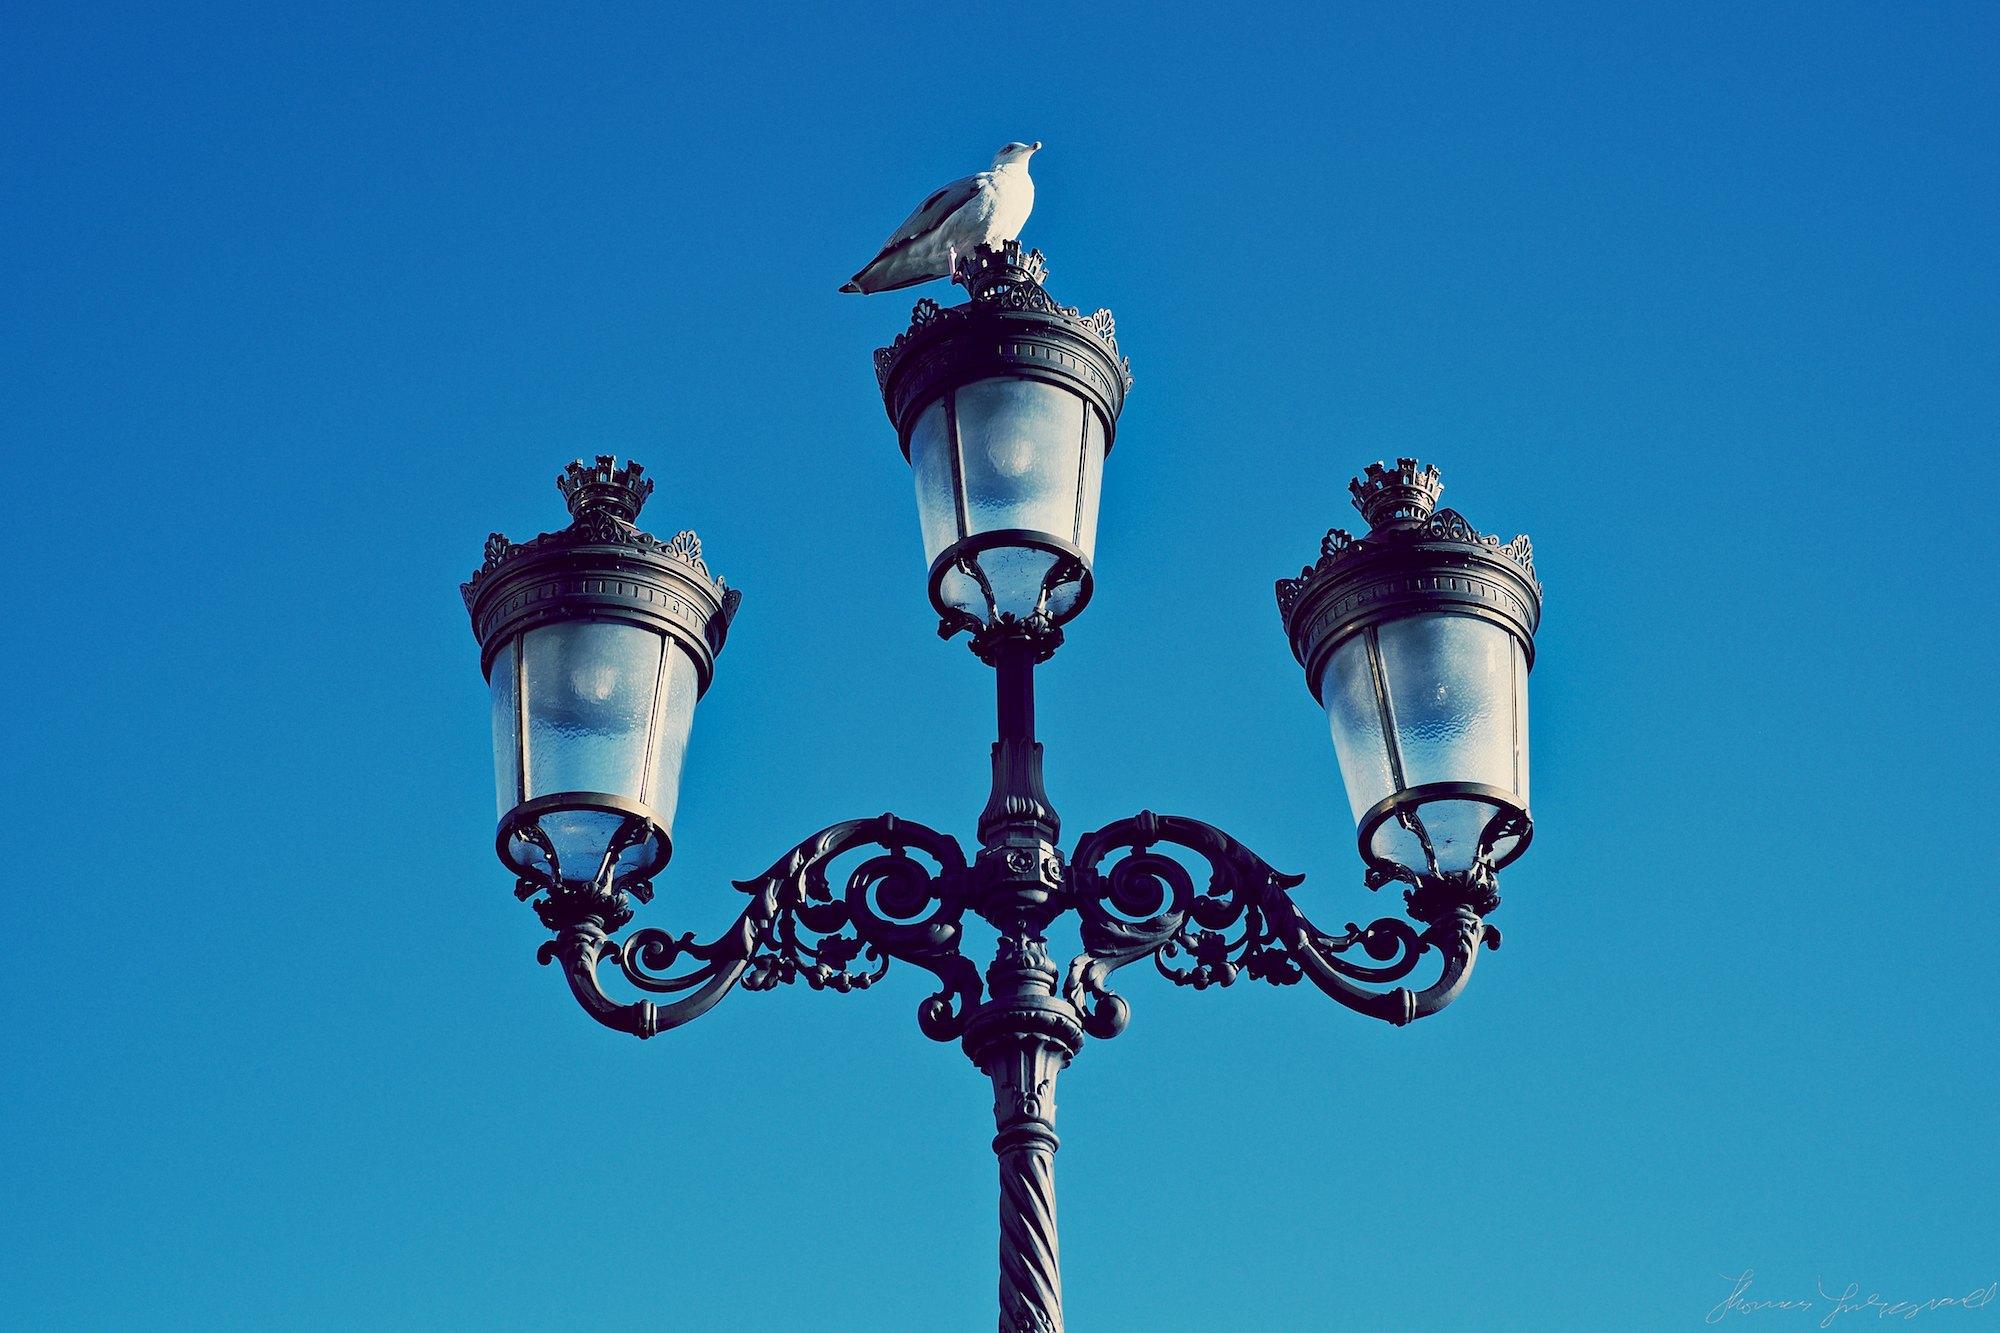 birds-and-lamp-shade